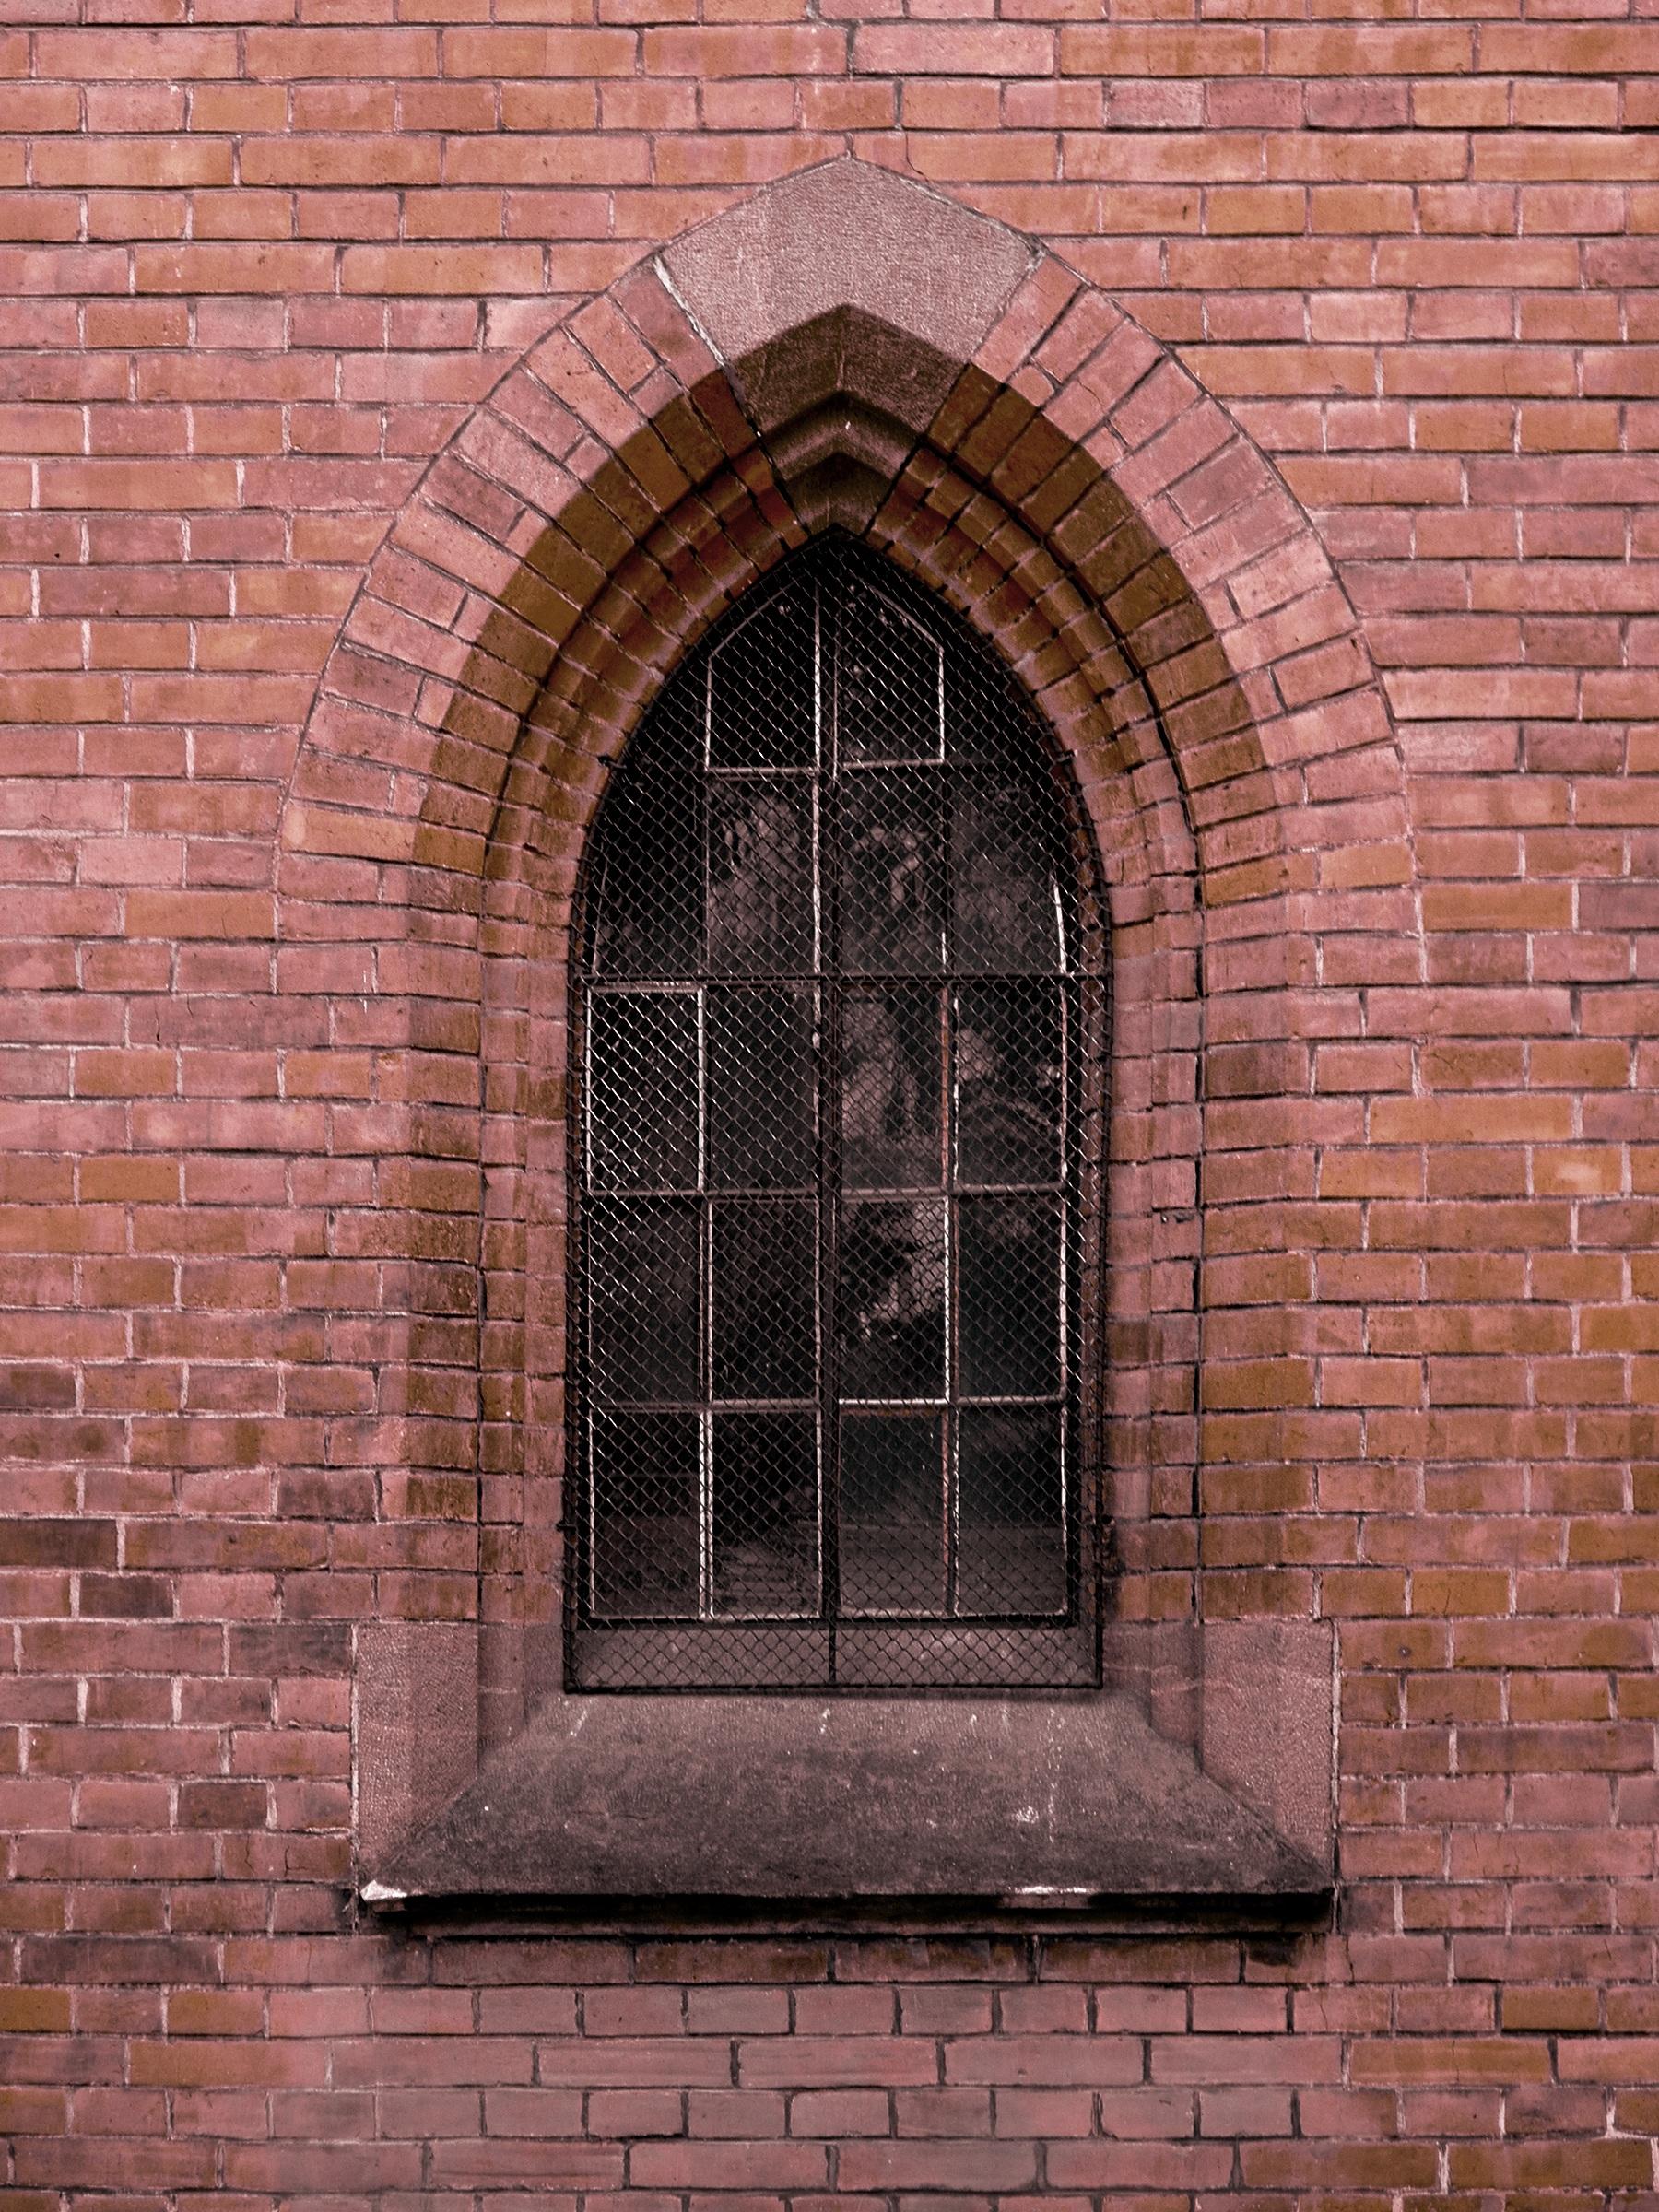 Architecture Window Wall Arch Facade Church Chapel Brick Door Material Iron Brickwork Gothic Revival